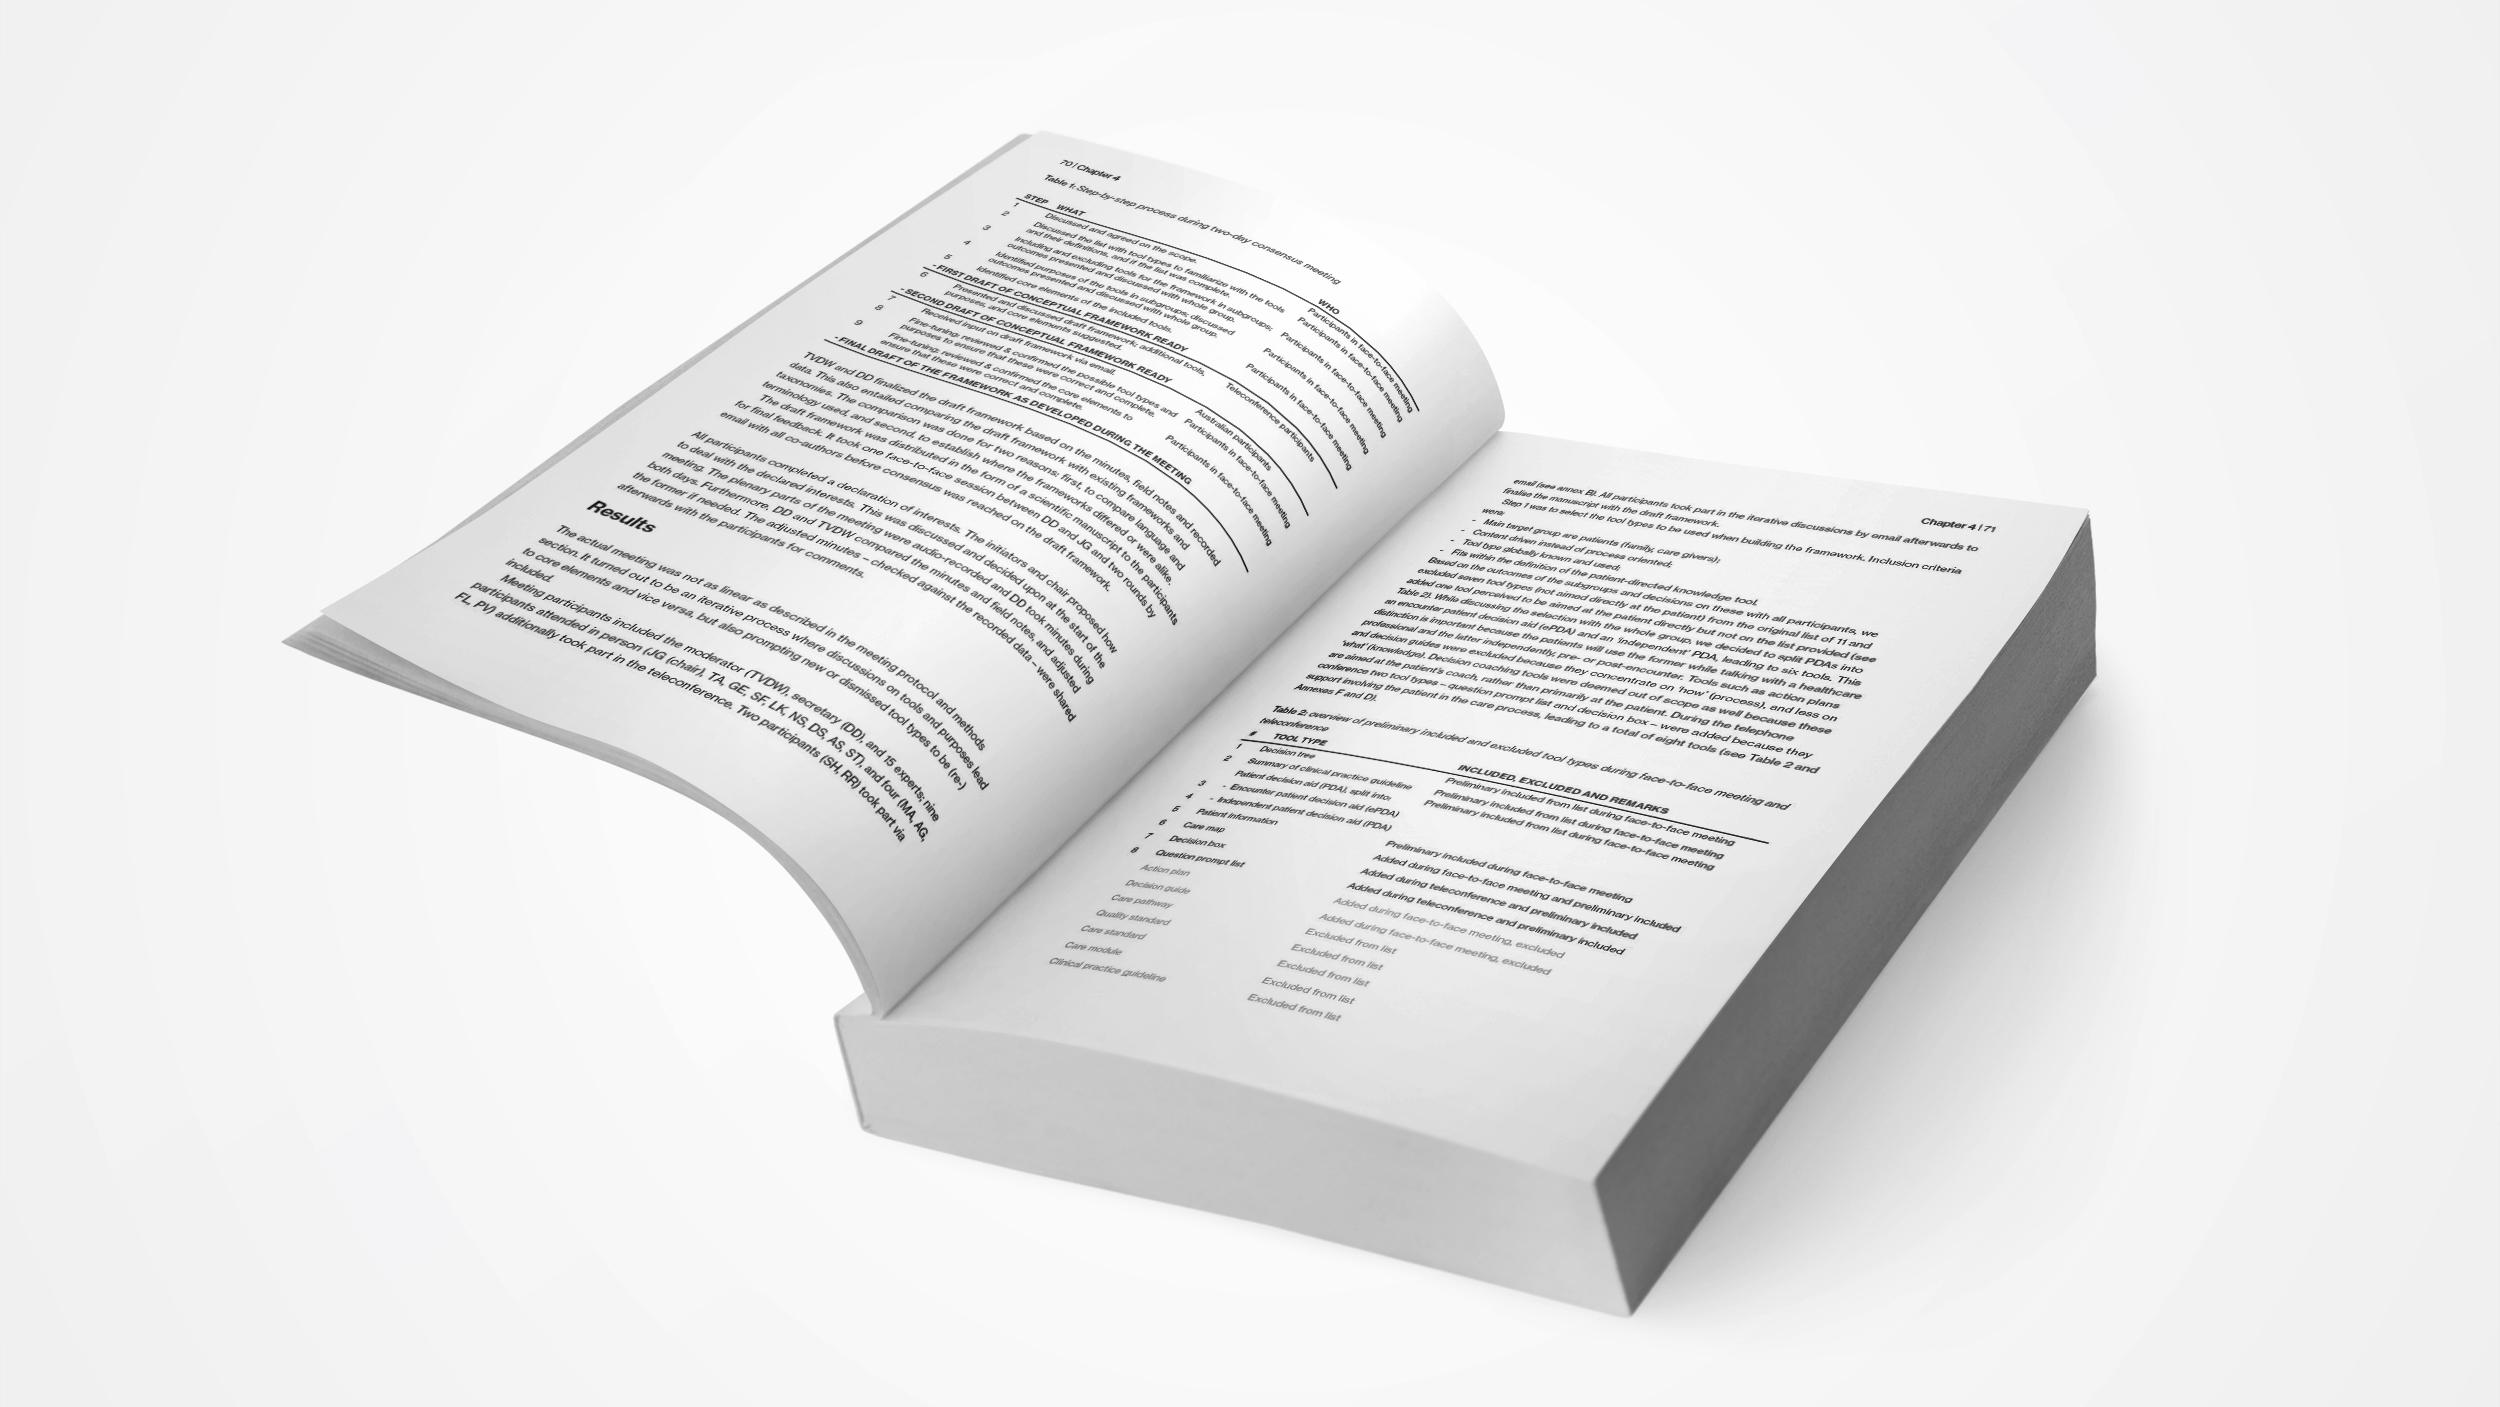 Proefschrift ontwerp - Vera Post